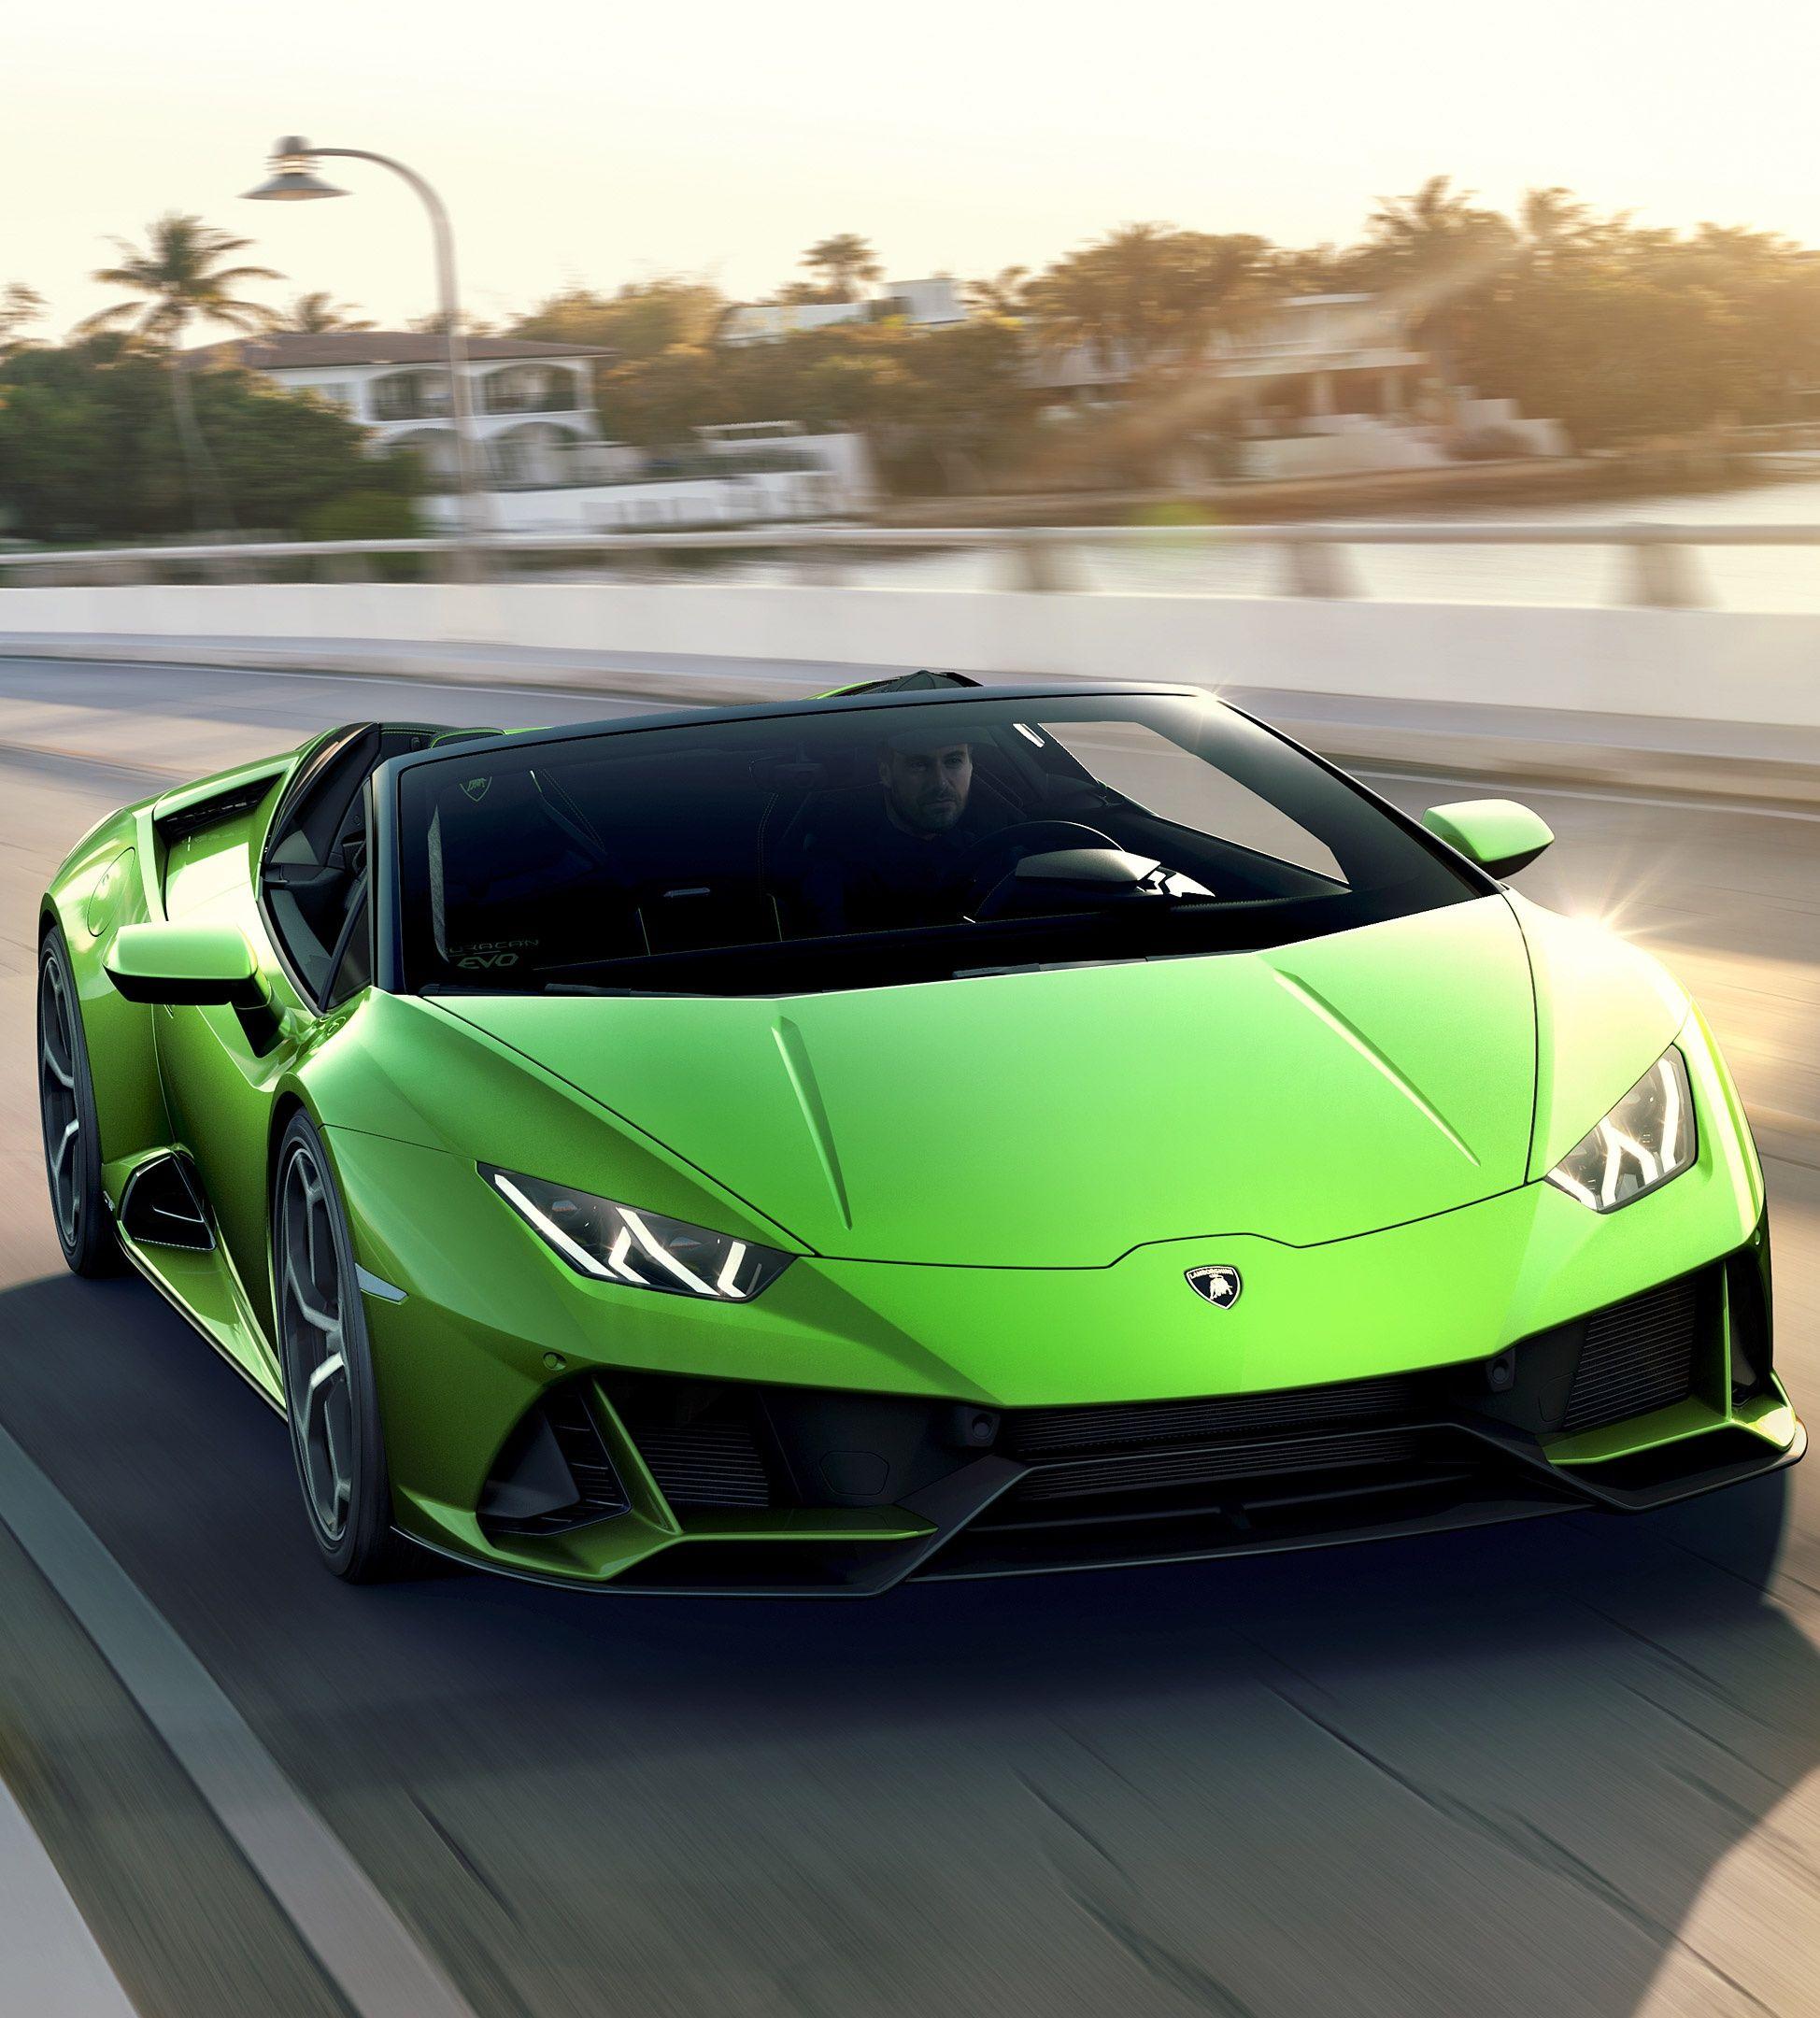 2019 Lamborghini Huracan Evo Spyder The Man Moving Fw